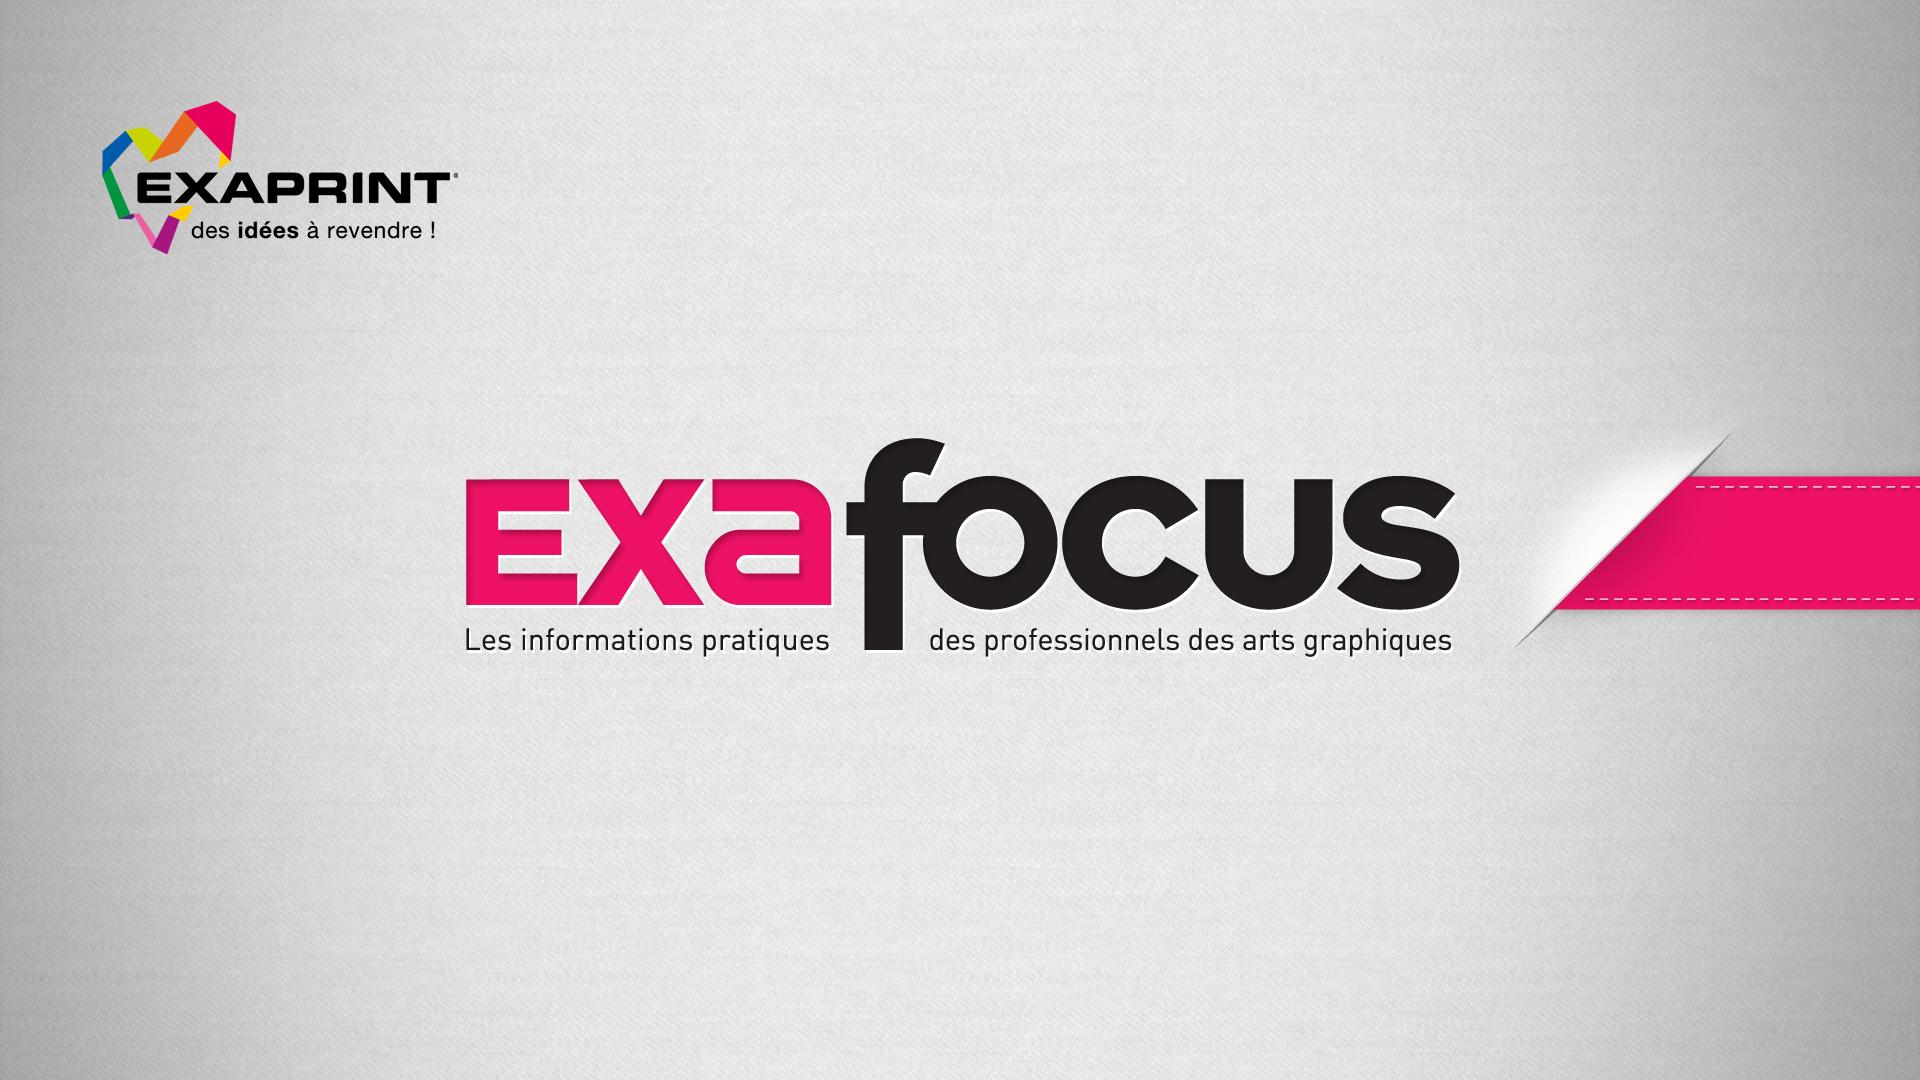 exaprint-exafocus-creation-logo-identite-plaquette-charte-editoriale-communication-caconcept-alexis-cretin-graphiste